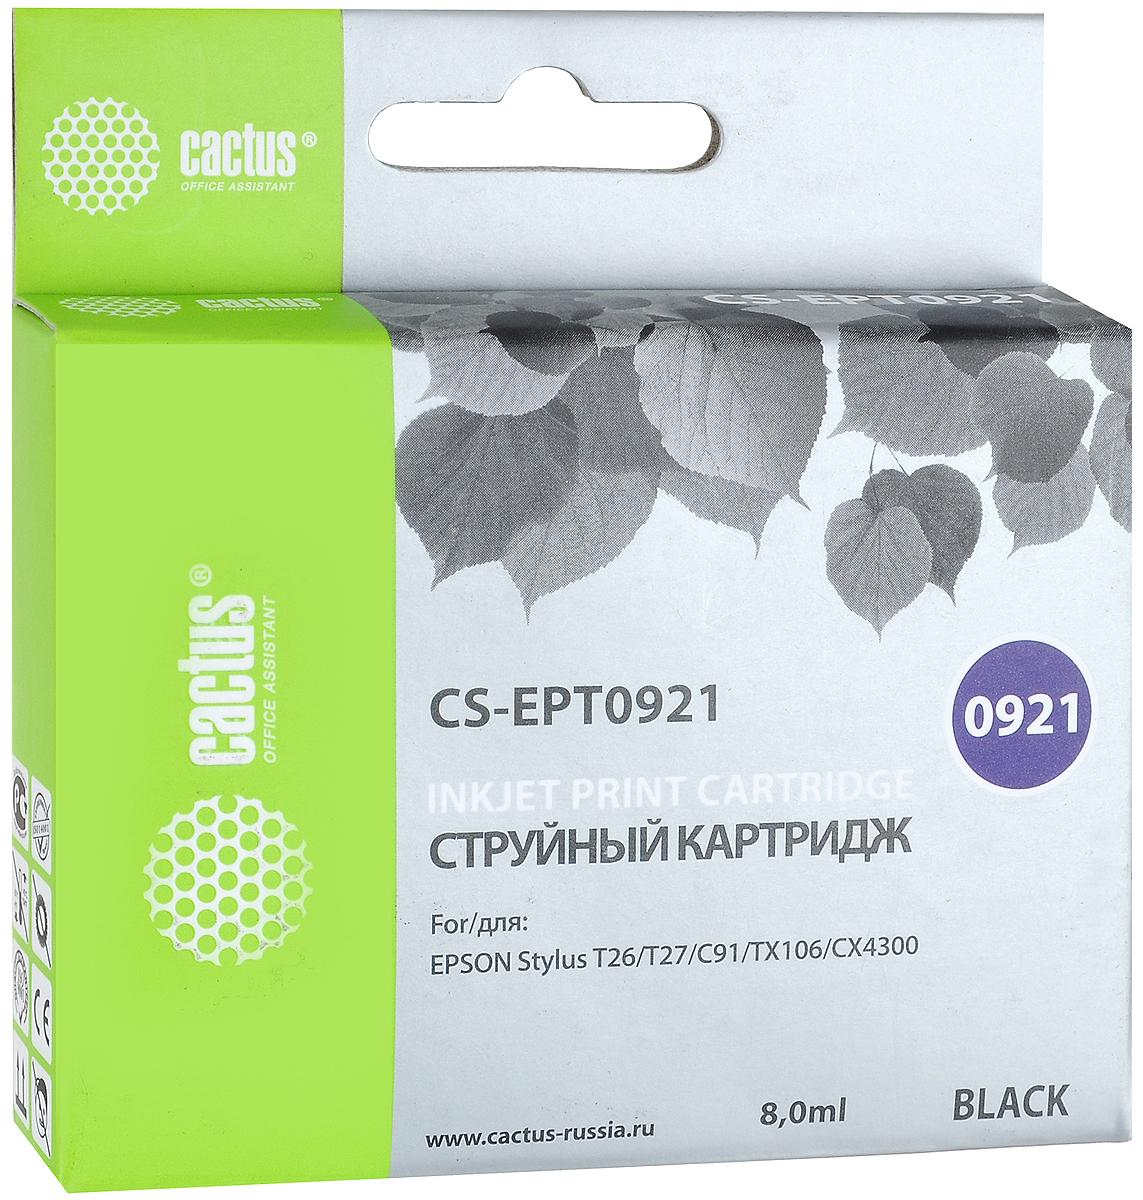 Cactus CS-EPT0921, Black картридж струйный для Epson Stylus C91/CX4300/T26/T27/TX106/TX109/TX117/TX119 original refurbished f195000 print head for epson c79 c91 cx3700 cx3900 t26 t27 tx106 tx109 tx117 tx119 tx210 tx219 printhead